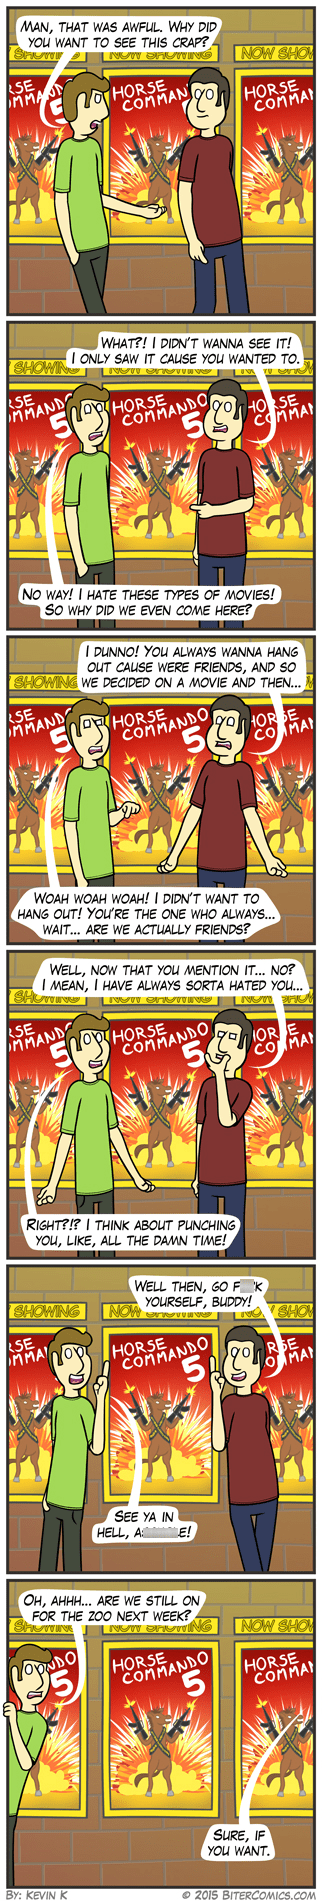 friendship,web comics